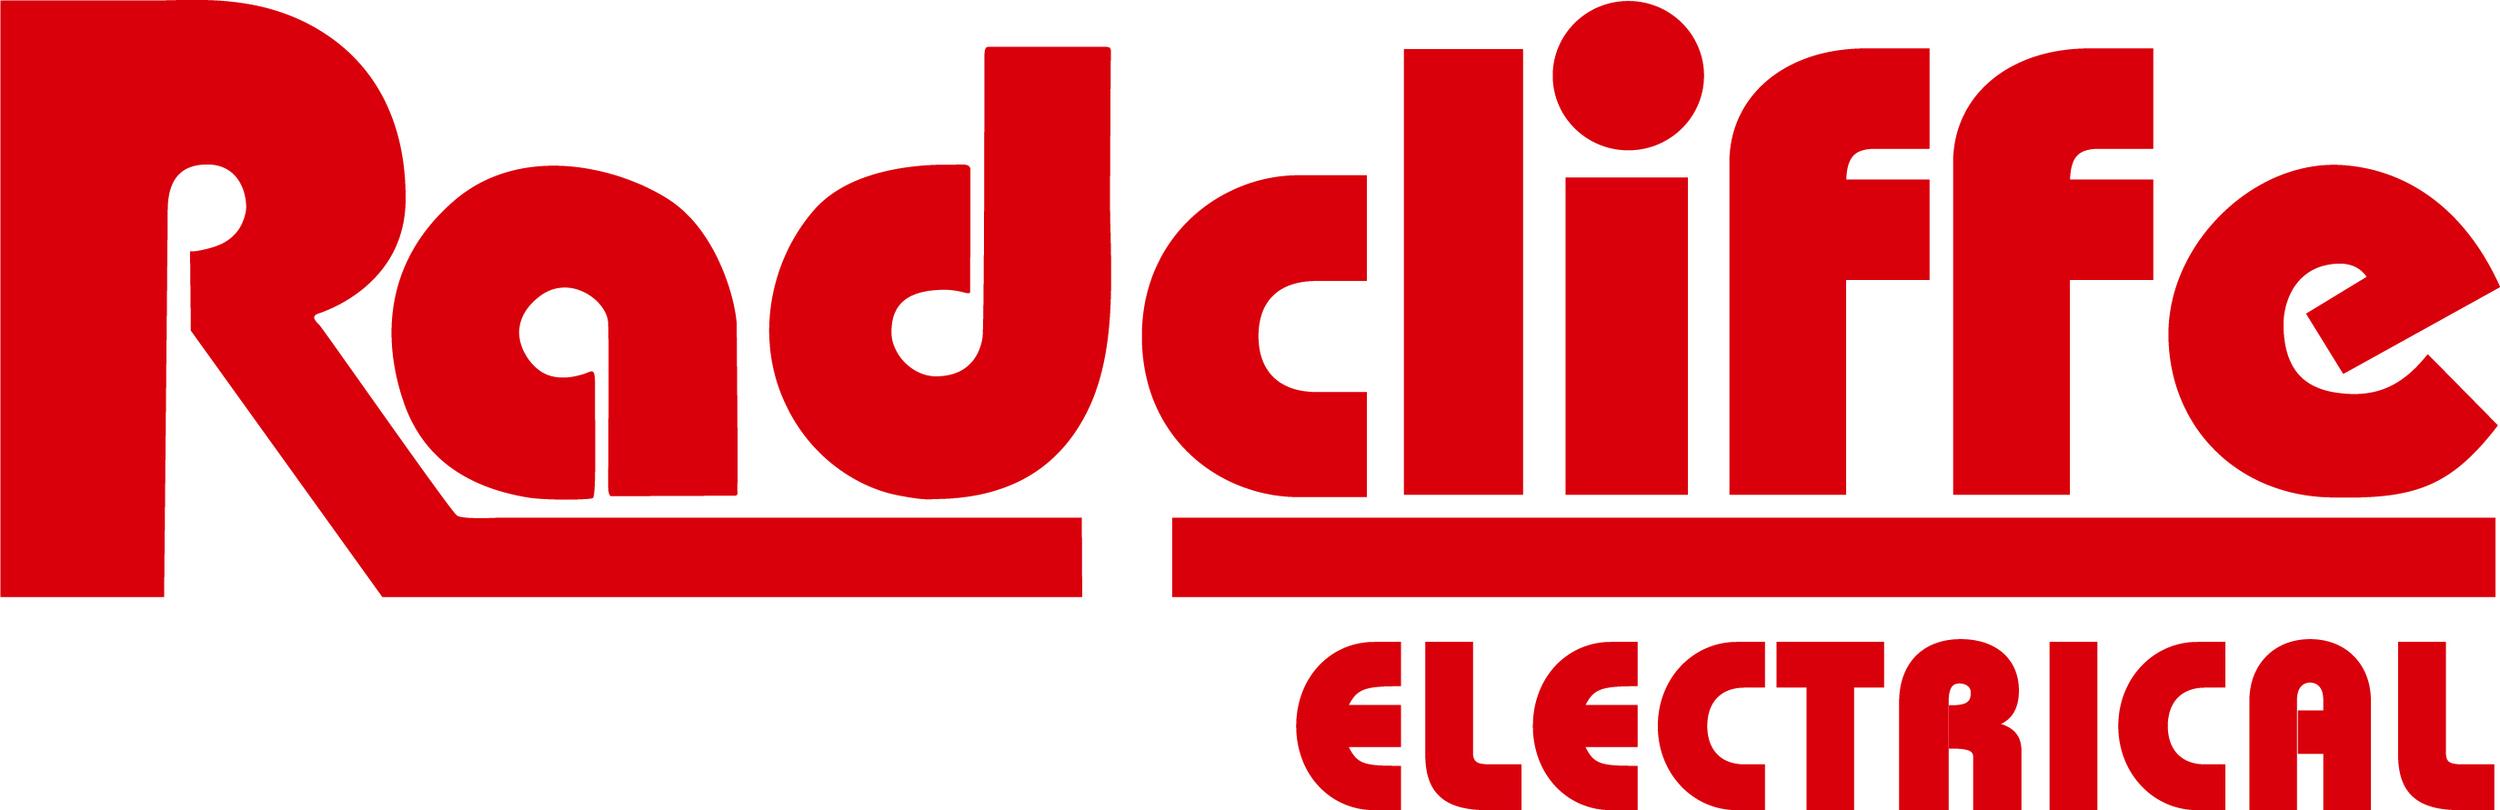 Radcliffe Electrical.jpg